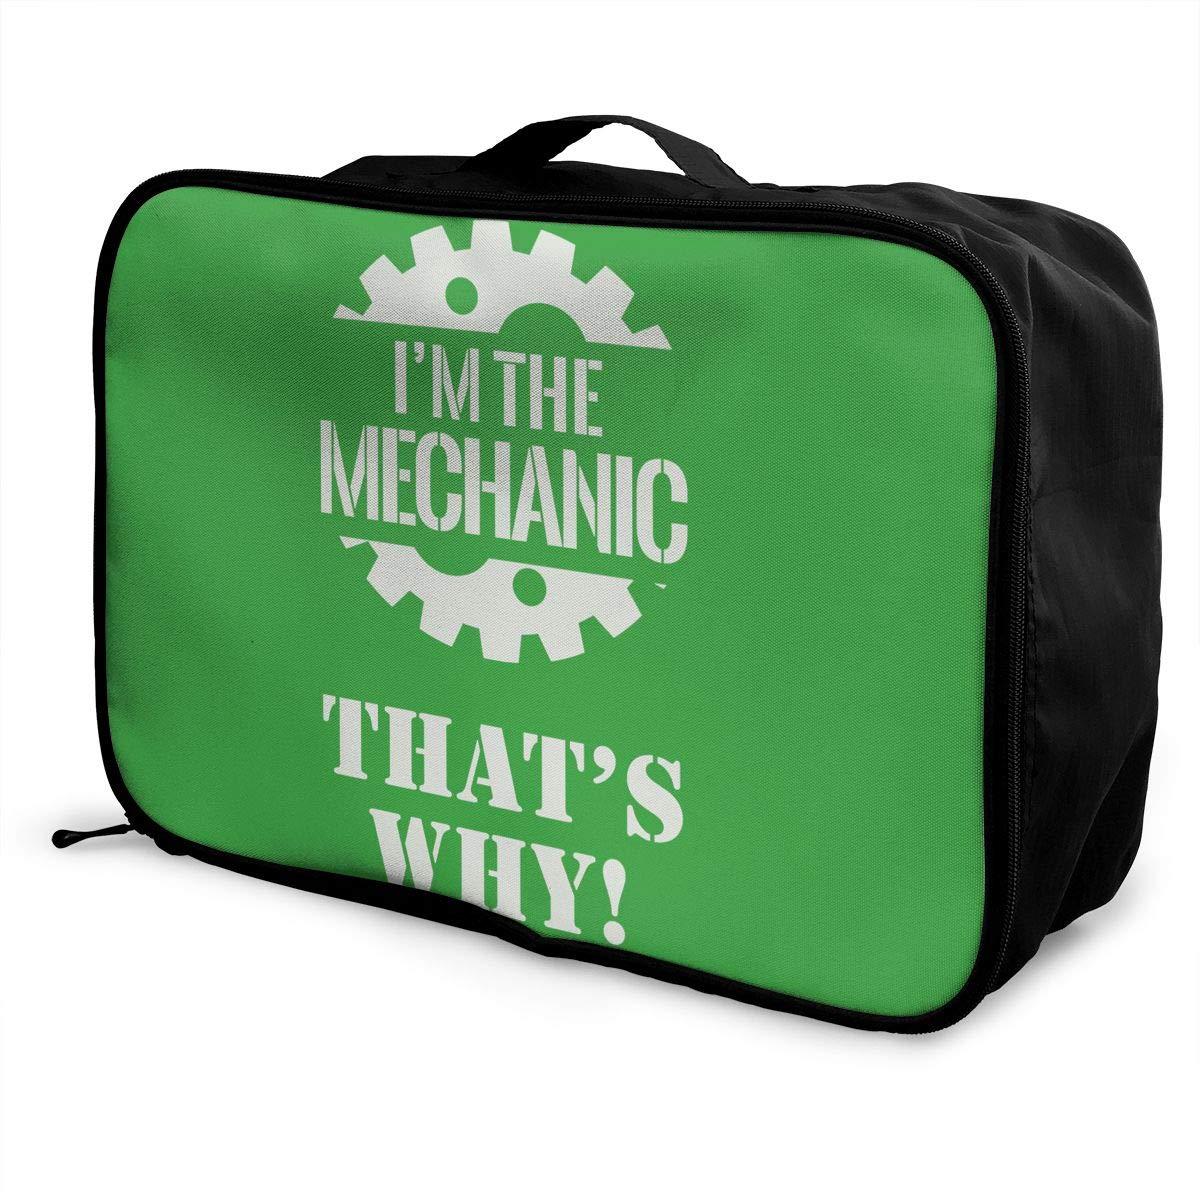 Travel Luggage Duffle Bag Lightweight Portable Handbag Mechanic Large Capacity Waterproof Foldable Storage Tote